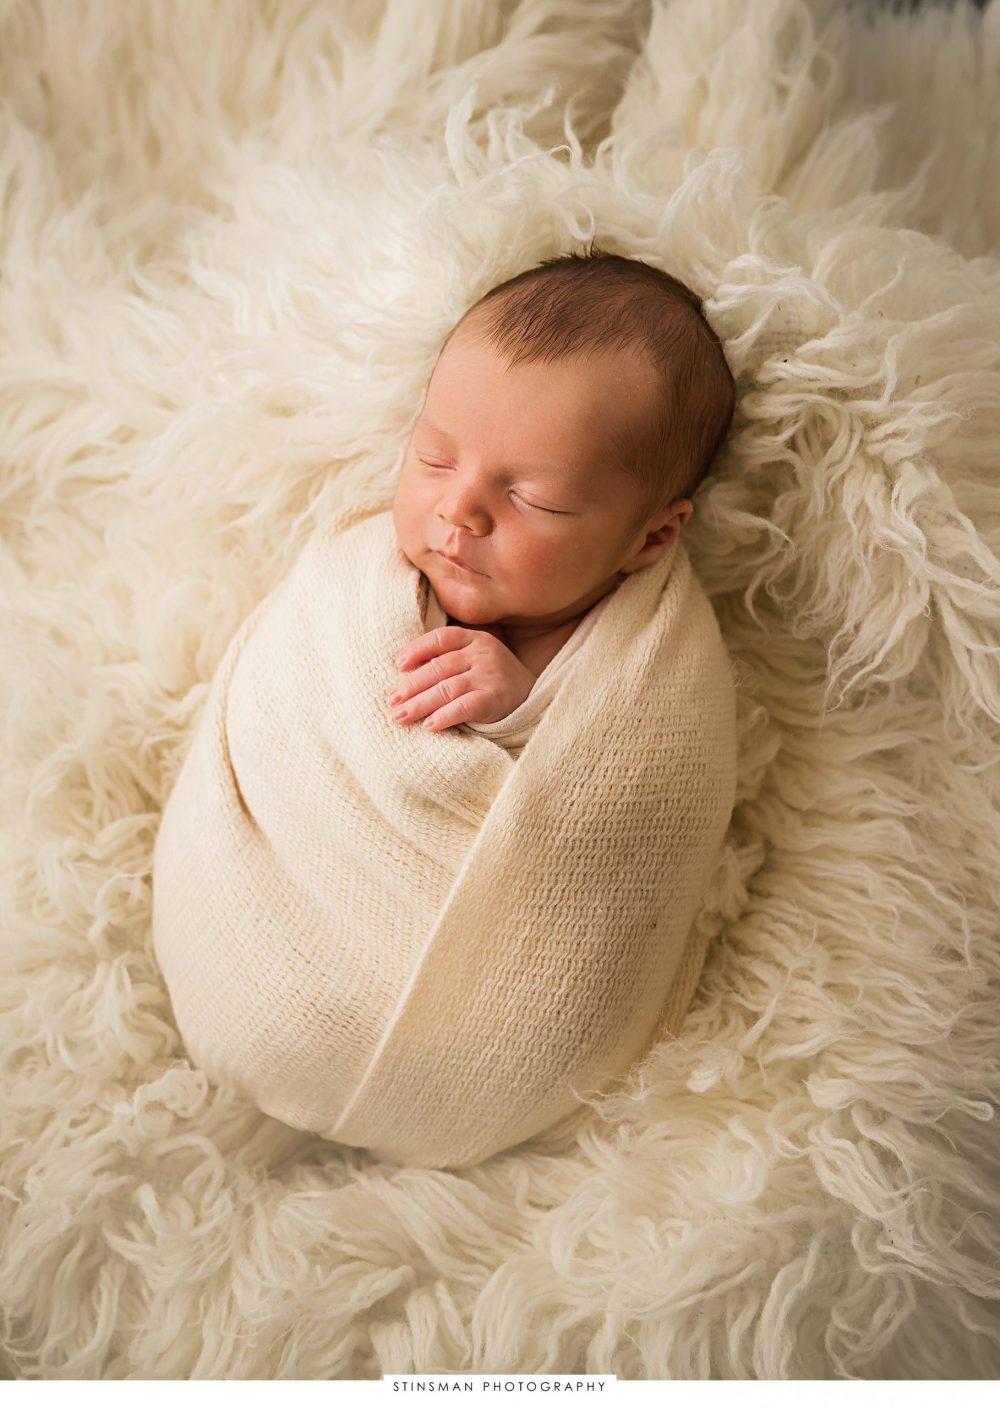 potato sack pose for newborn photography